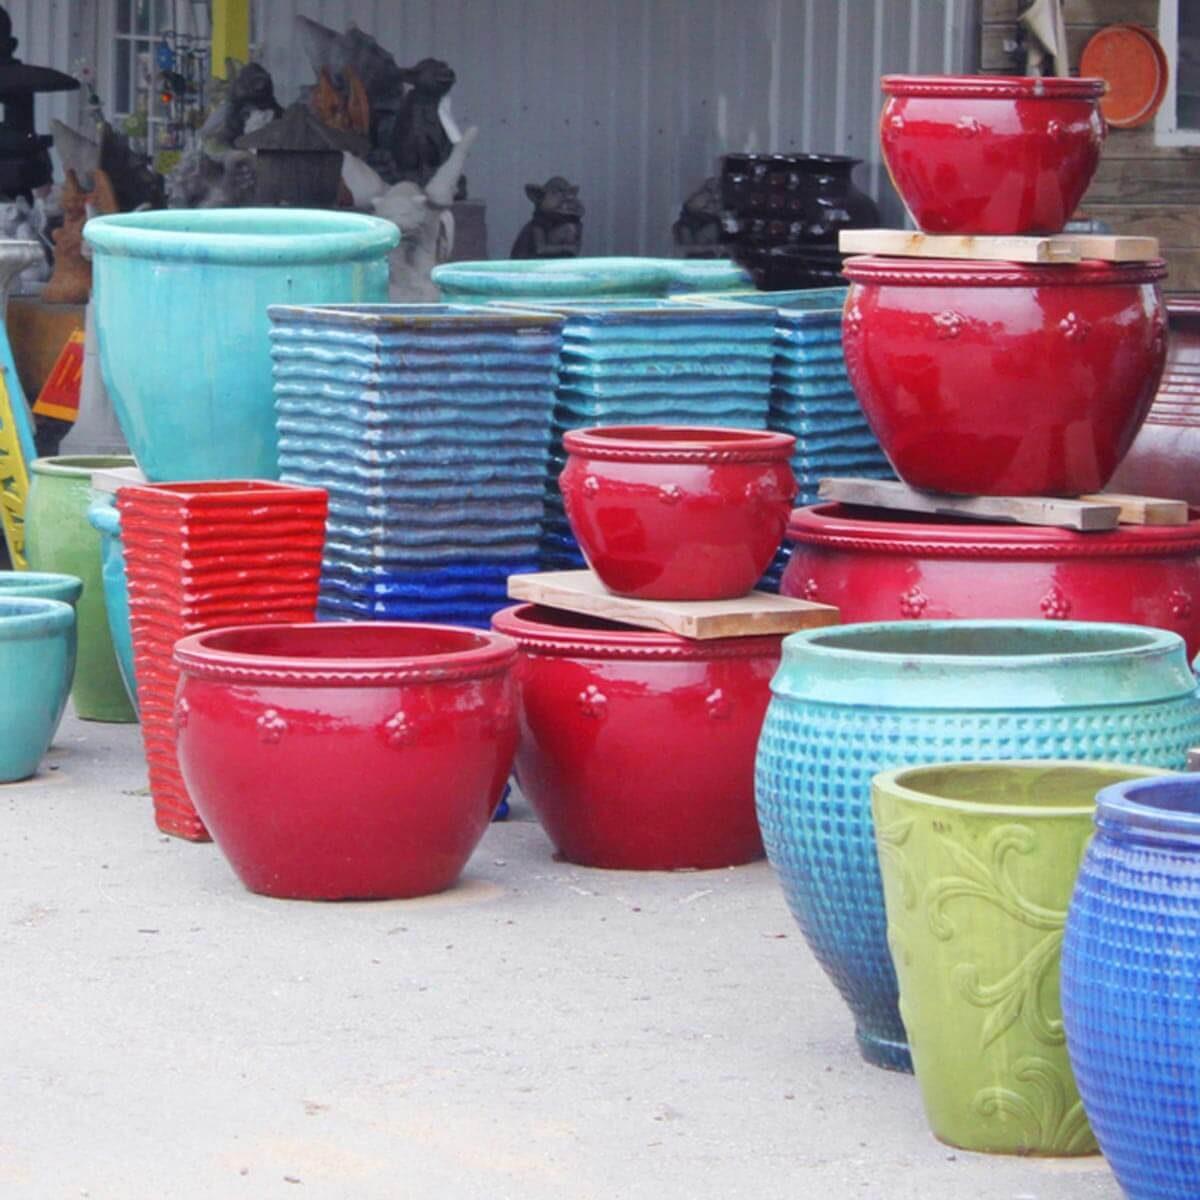 flower planter_124432603_01 flower pots